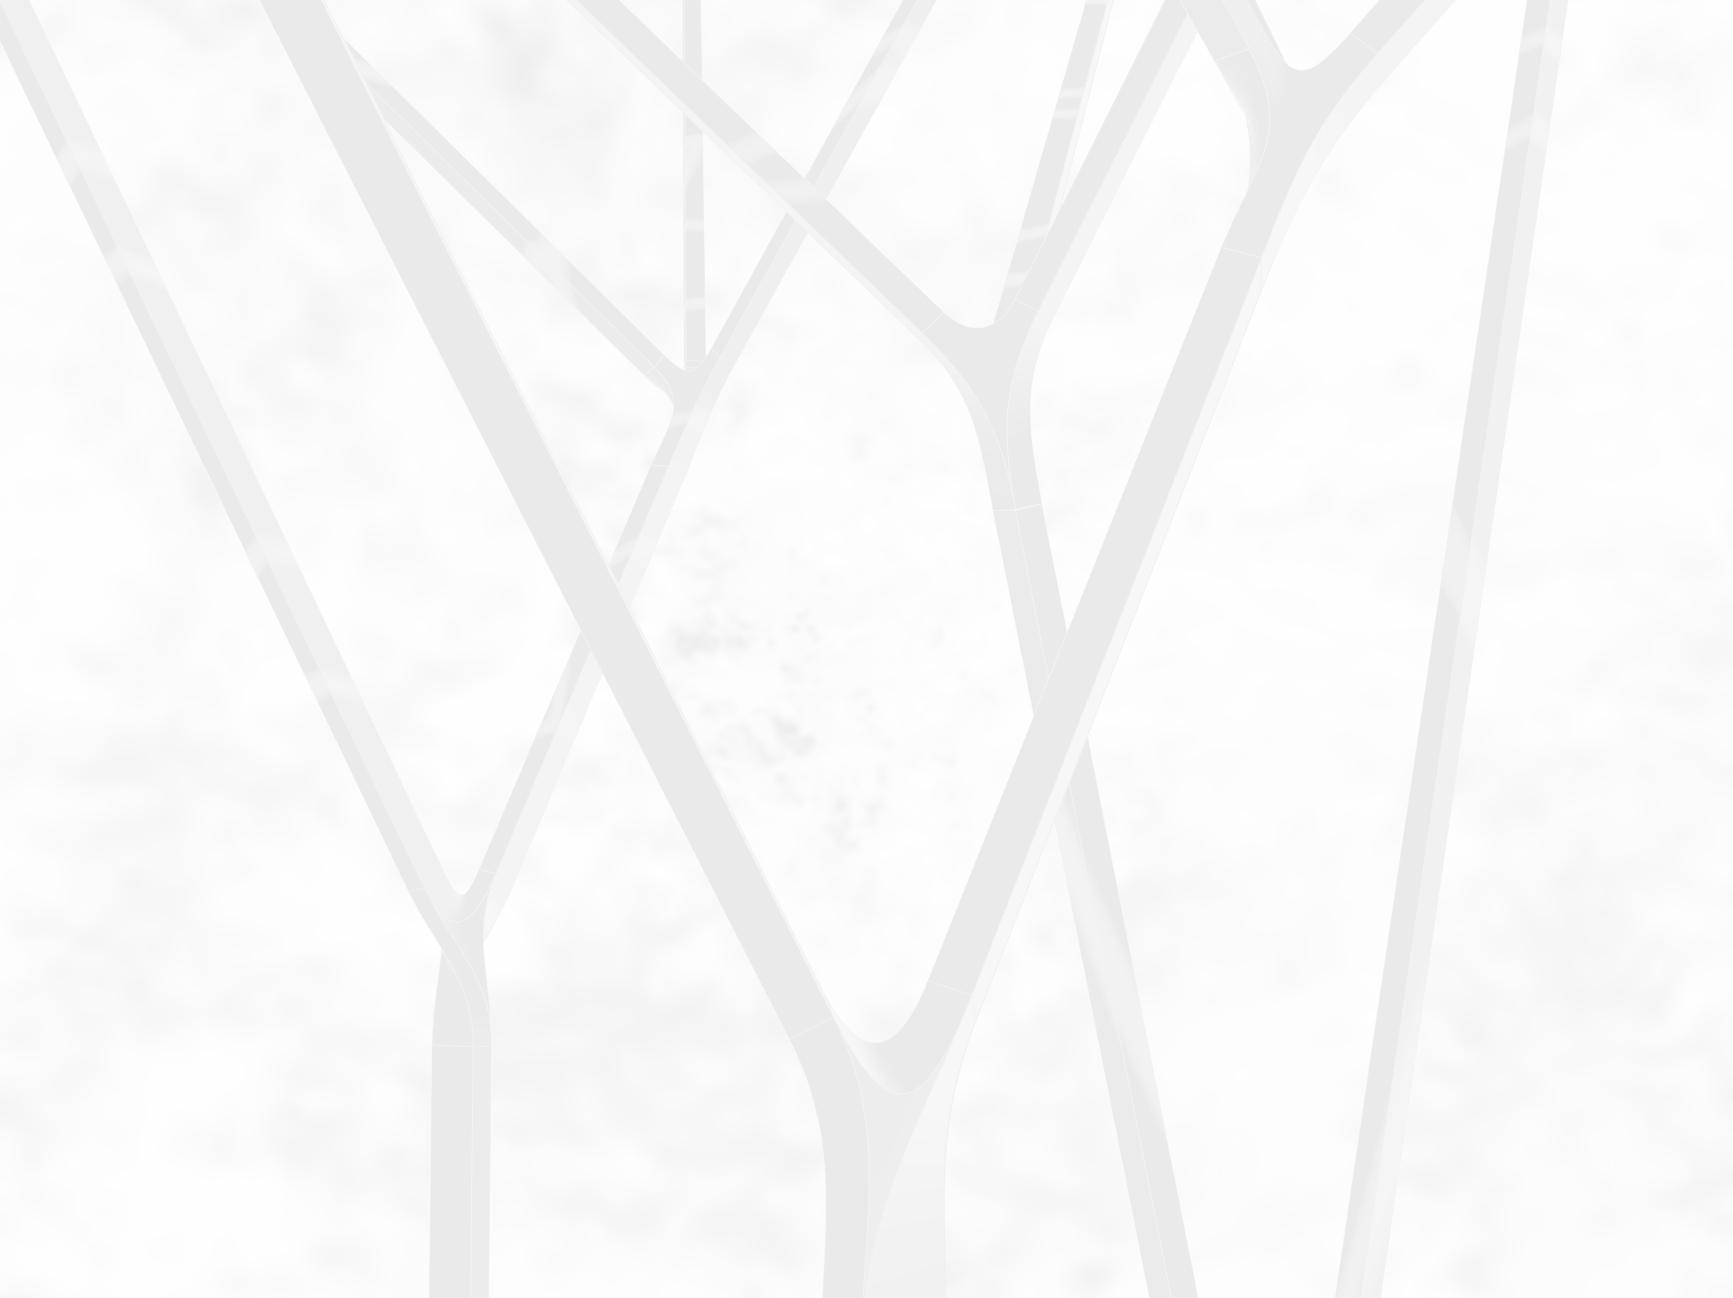 Branches_light invert.jpg